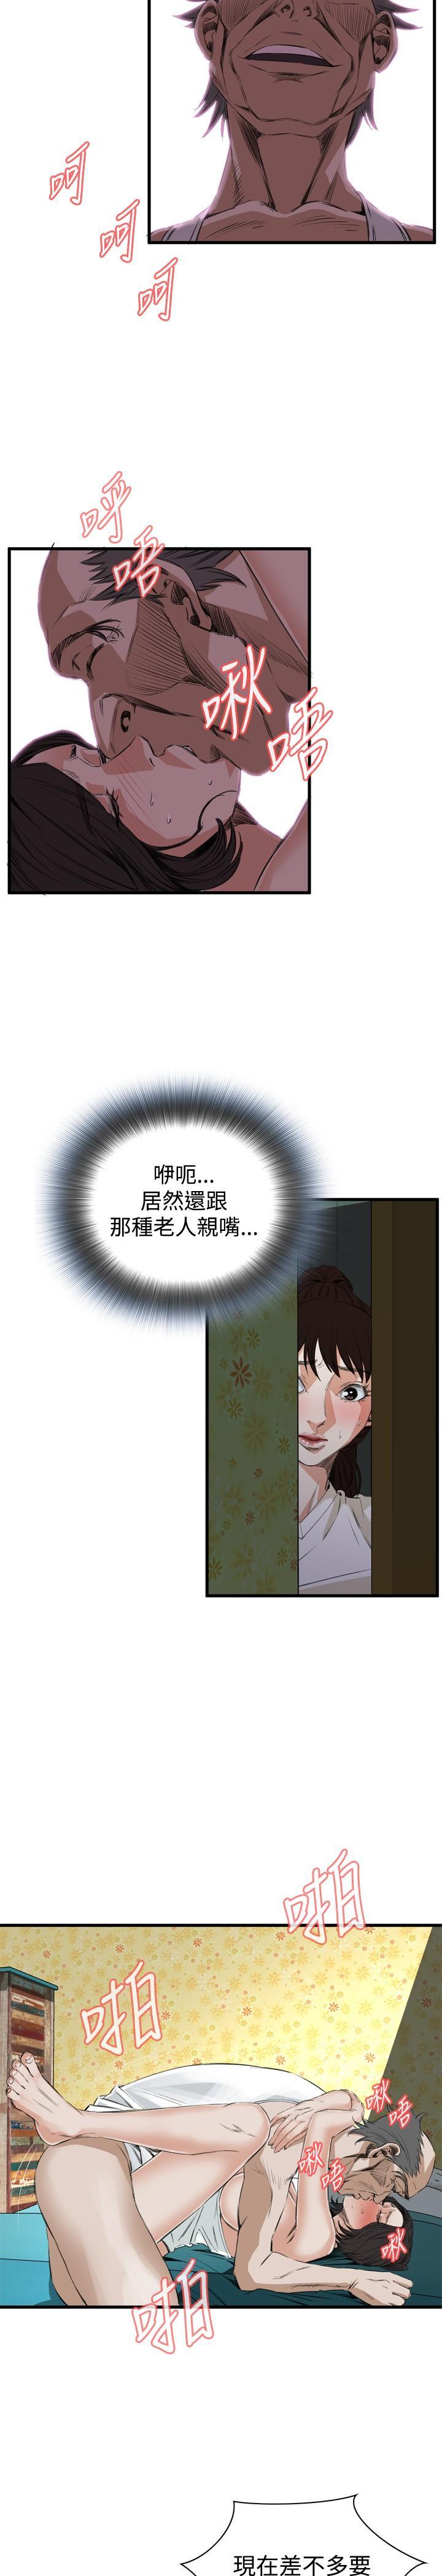 Take a Peek 偷窥 Ch.39~51 [Chinese]中文 167